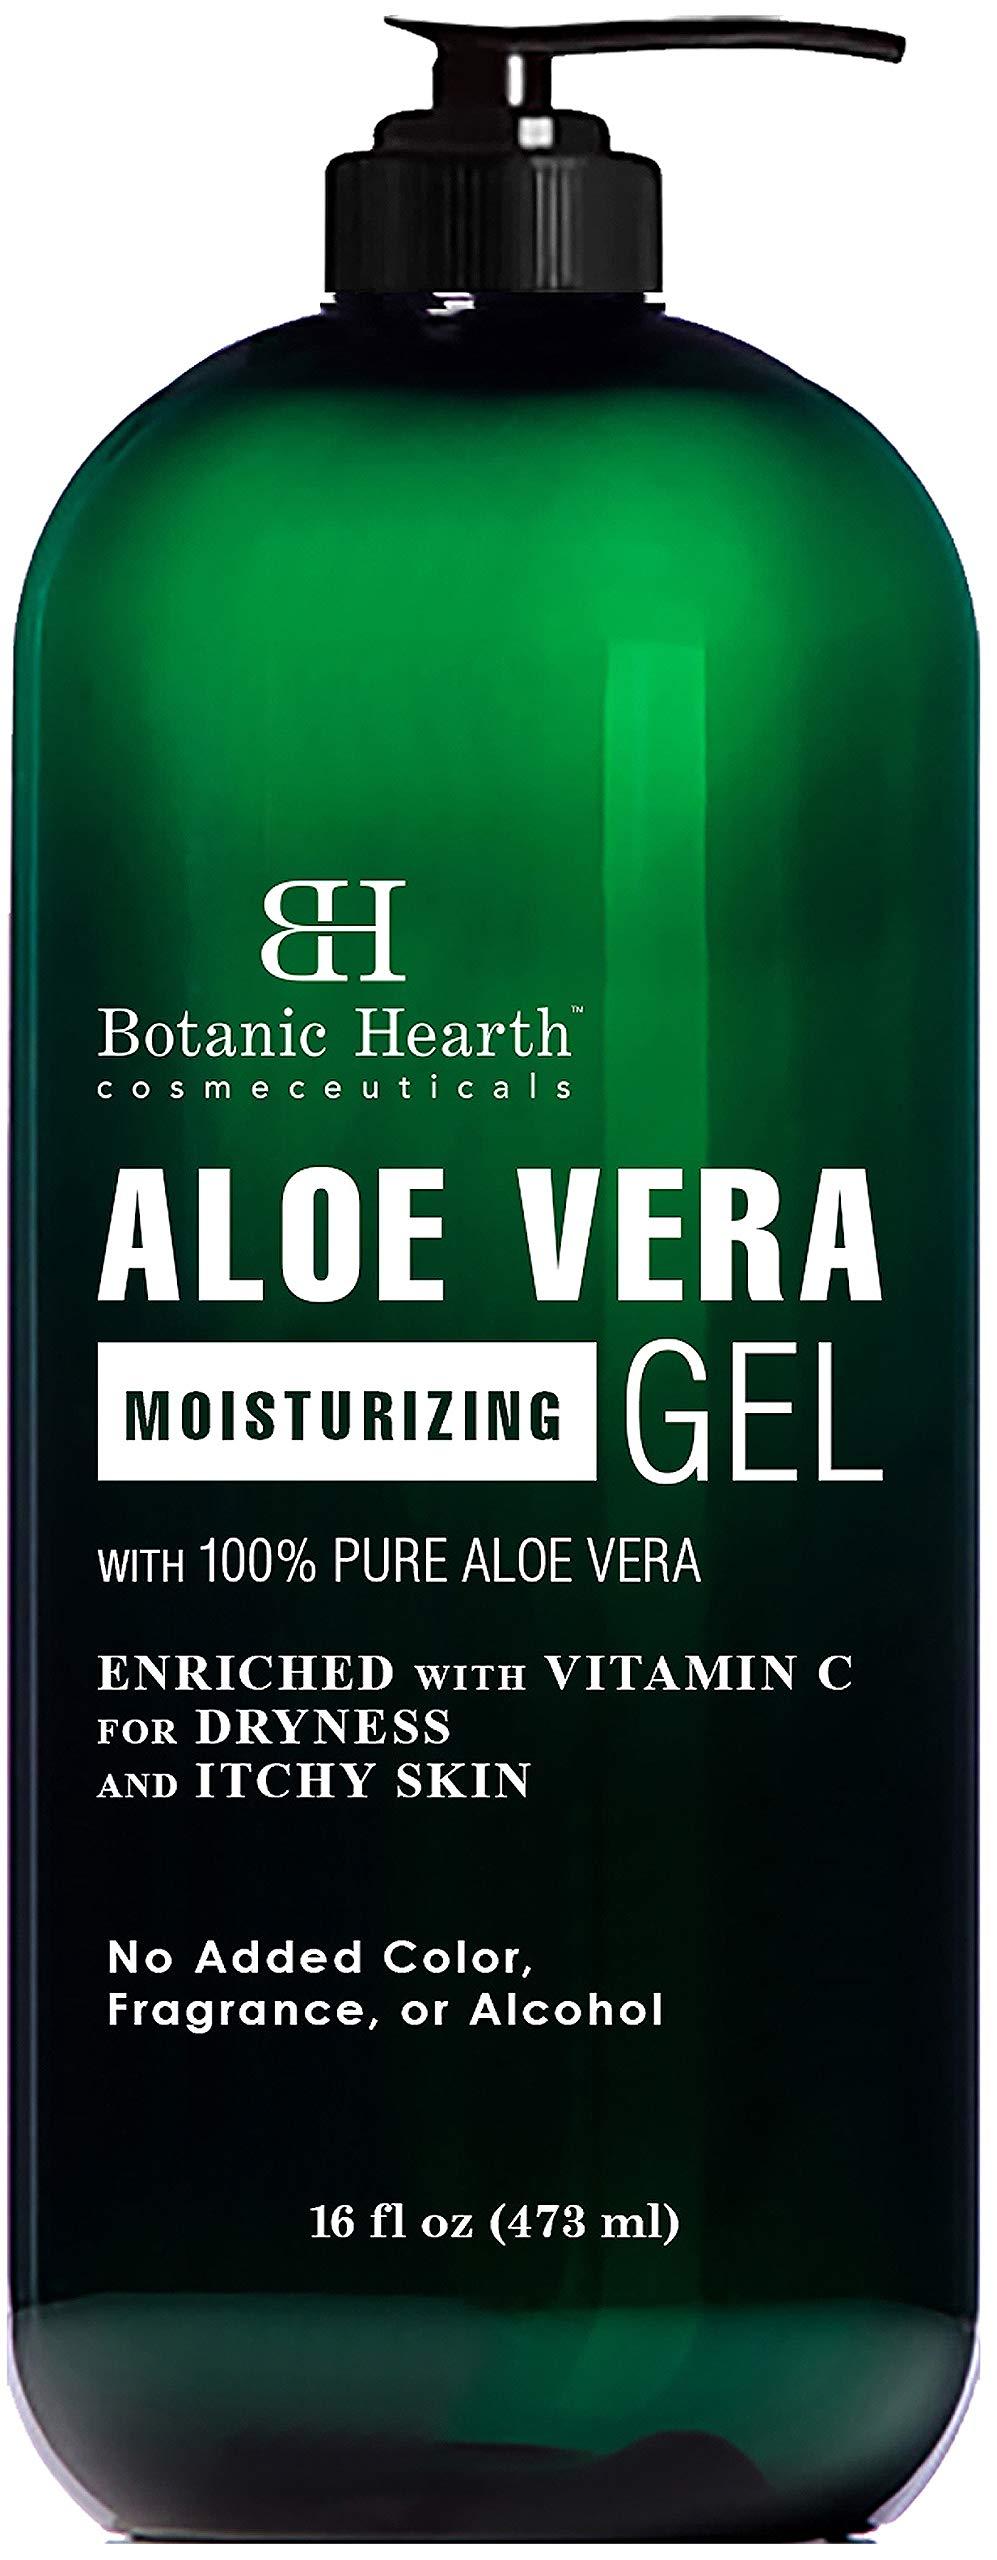 Botanic Hearth Aloe Vera Gel - From 100% Pure and Natural Cold Pressed Aloe Vera, 16 fl oz by Botanic Hearth